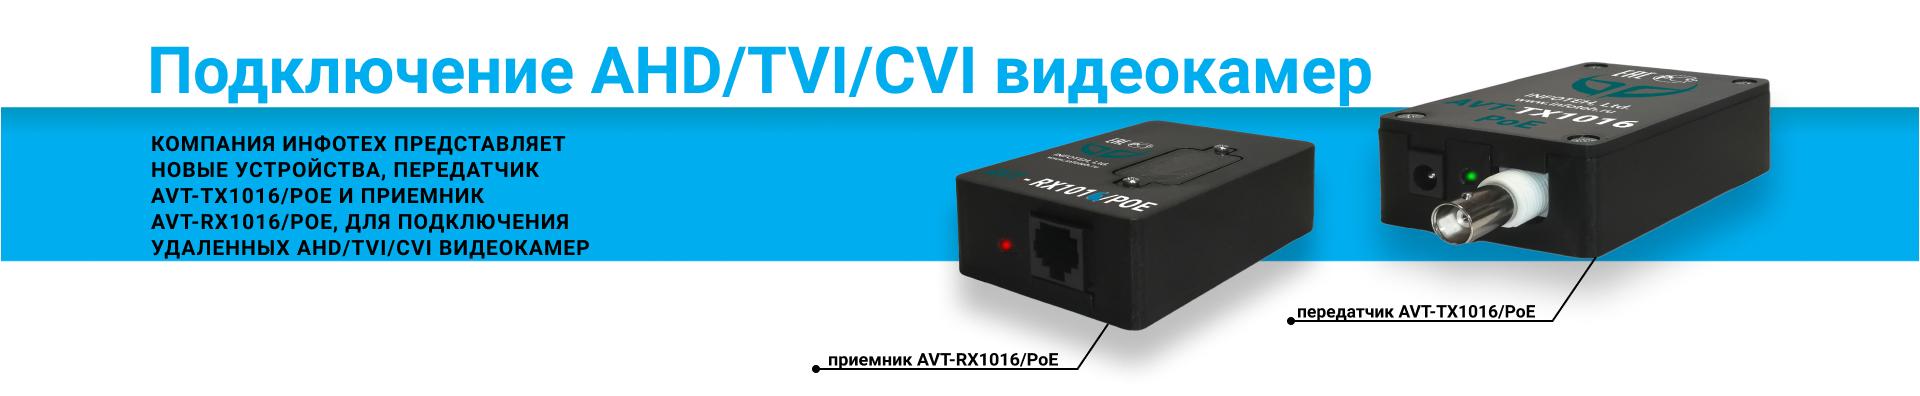 Подключение AHD/TVI/CVI видеокамер вместе с питанием по кабелю UTP до 600 метров